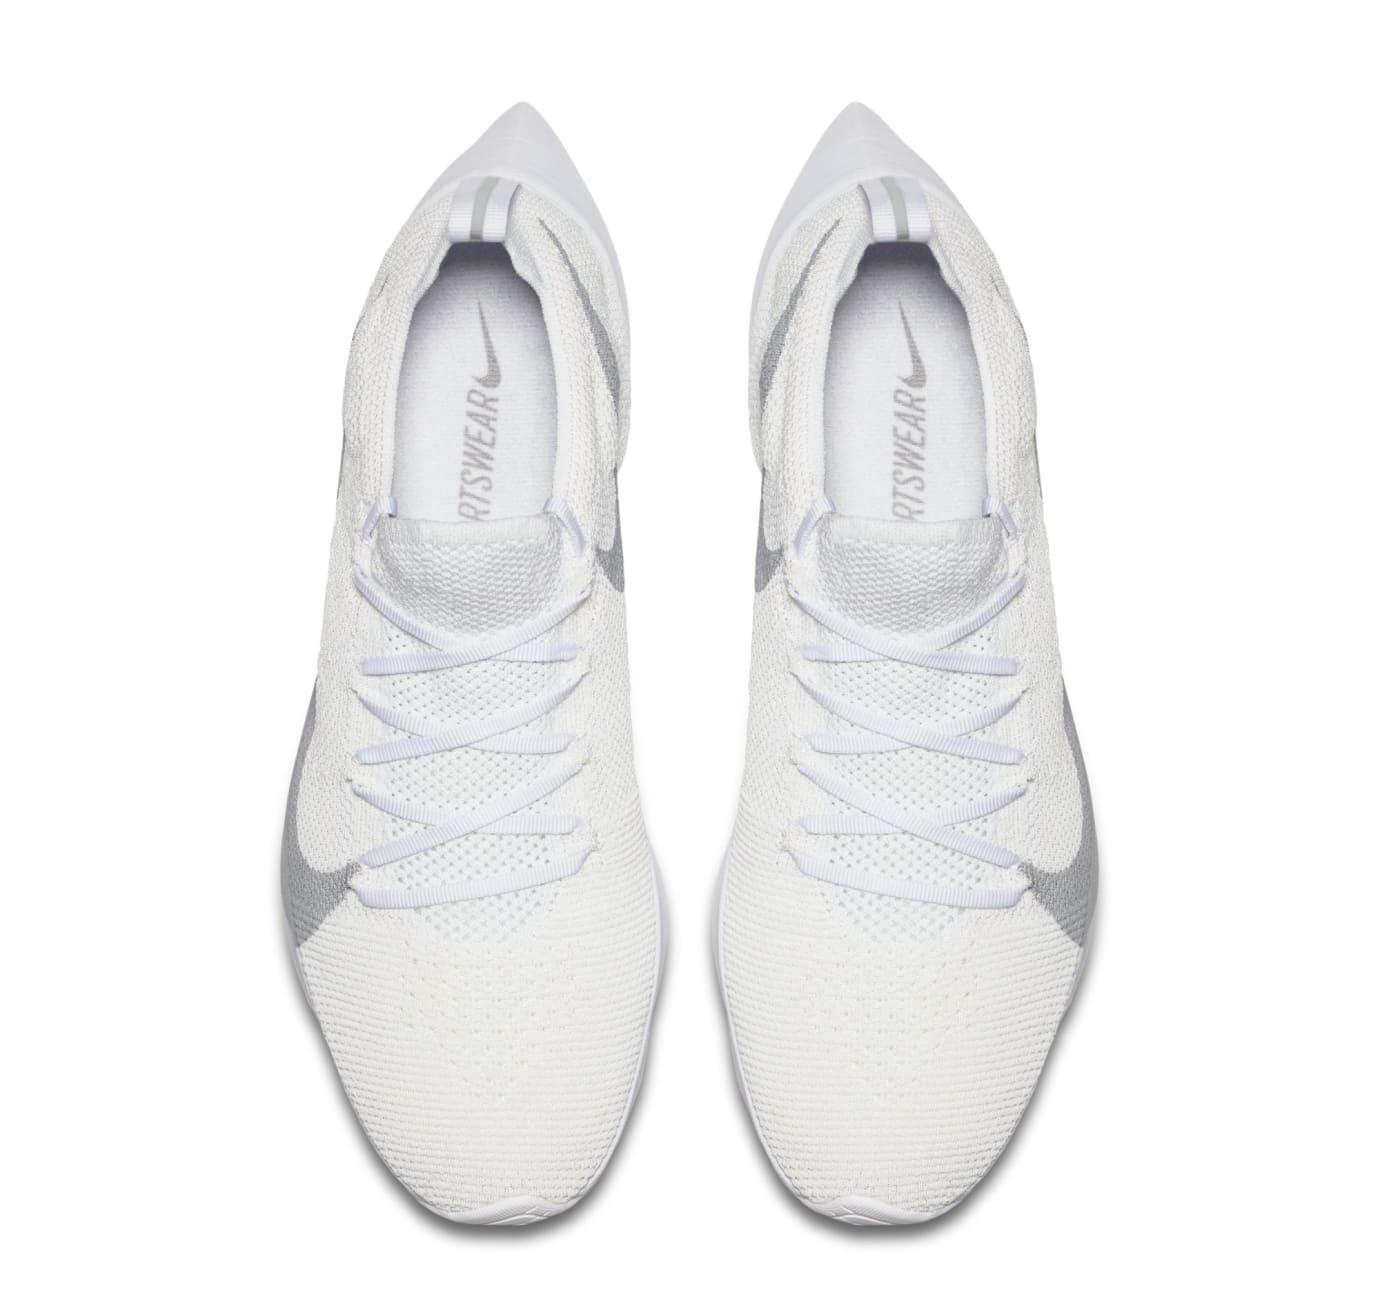 91ccf7eac8bdf Image via Nike Nike Vapor Street Flyknit  White Wolf Grey  AQ1763-100 (Top)